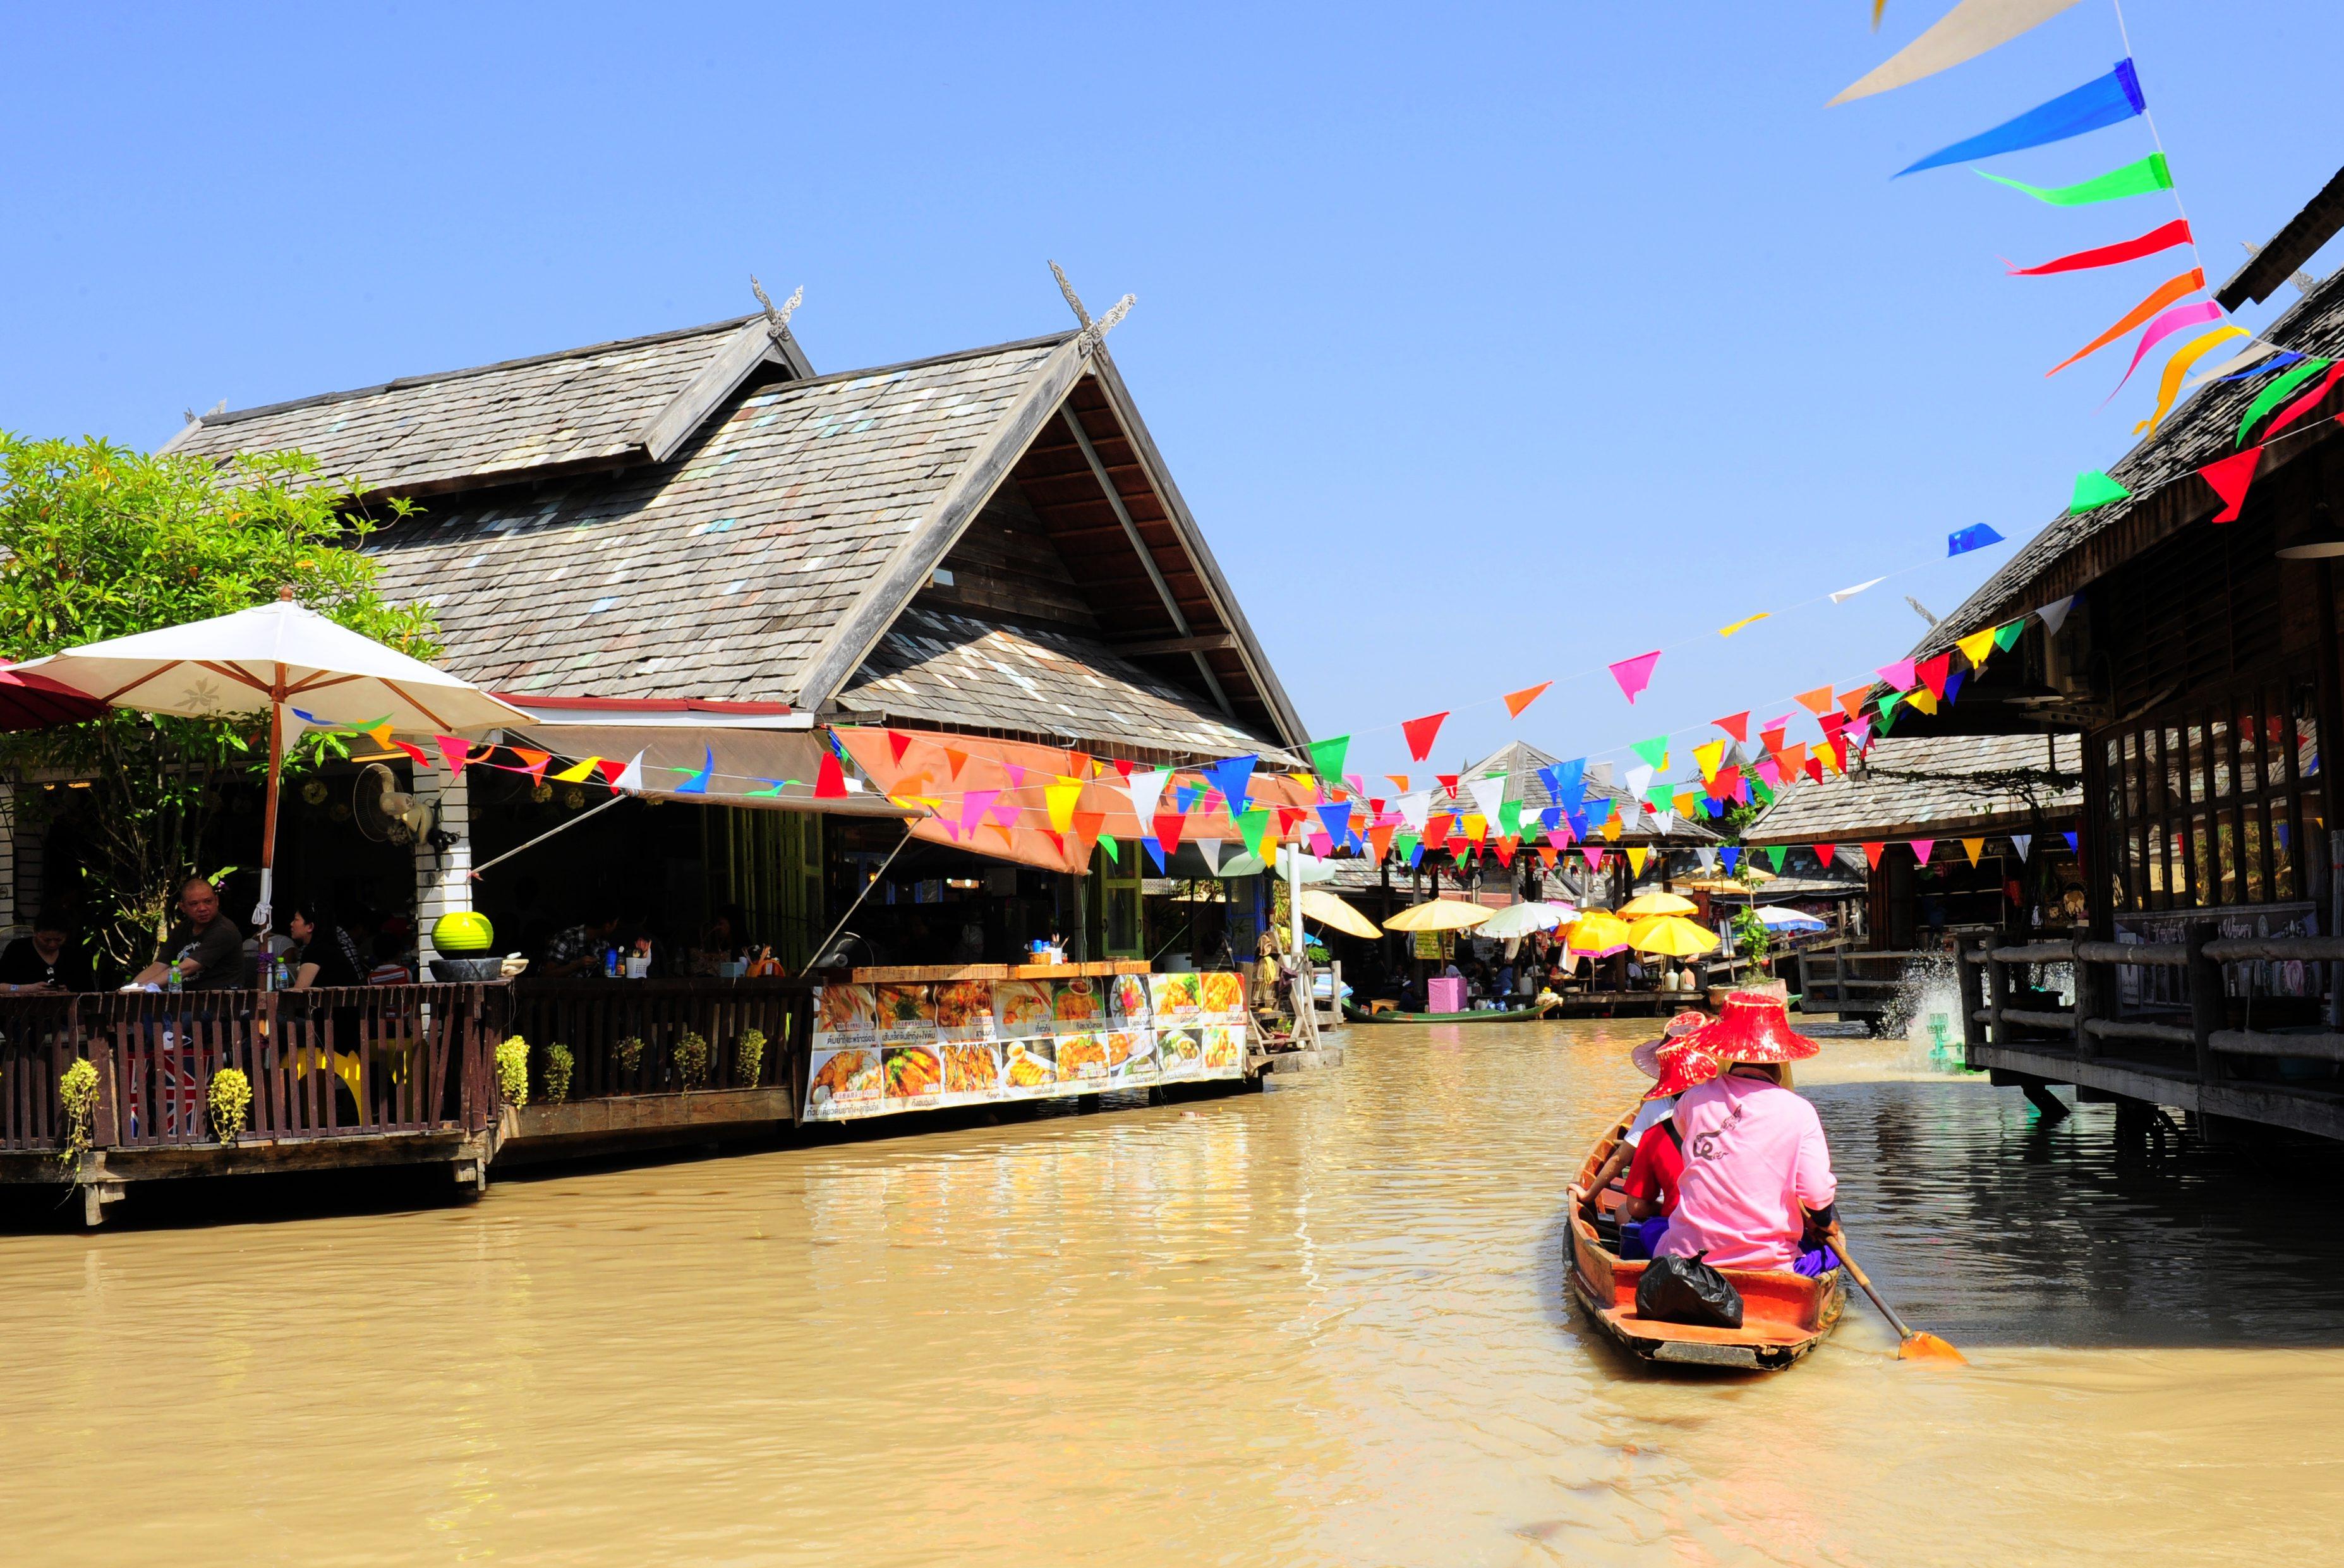 Pattaya Floating Market, Chon Buri *** Local Caption *** ตลาดน้ำ 4 ภาค พัทยา จังหวัดชลบุรี